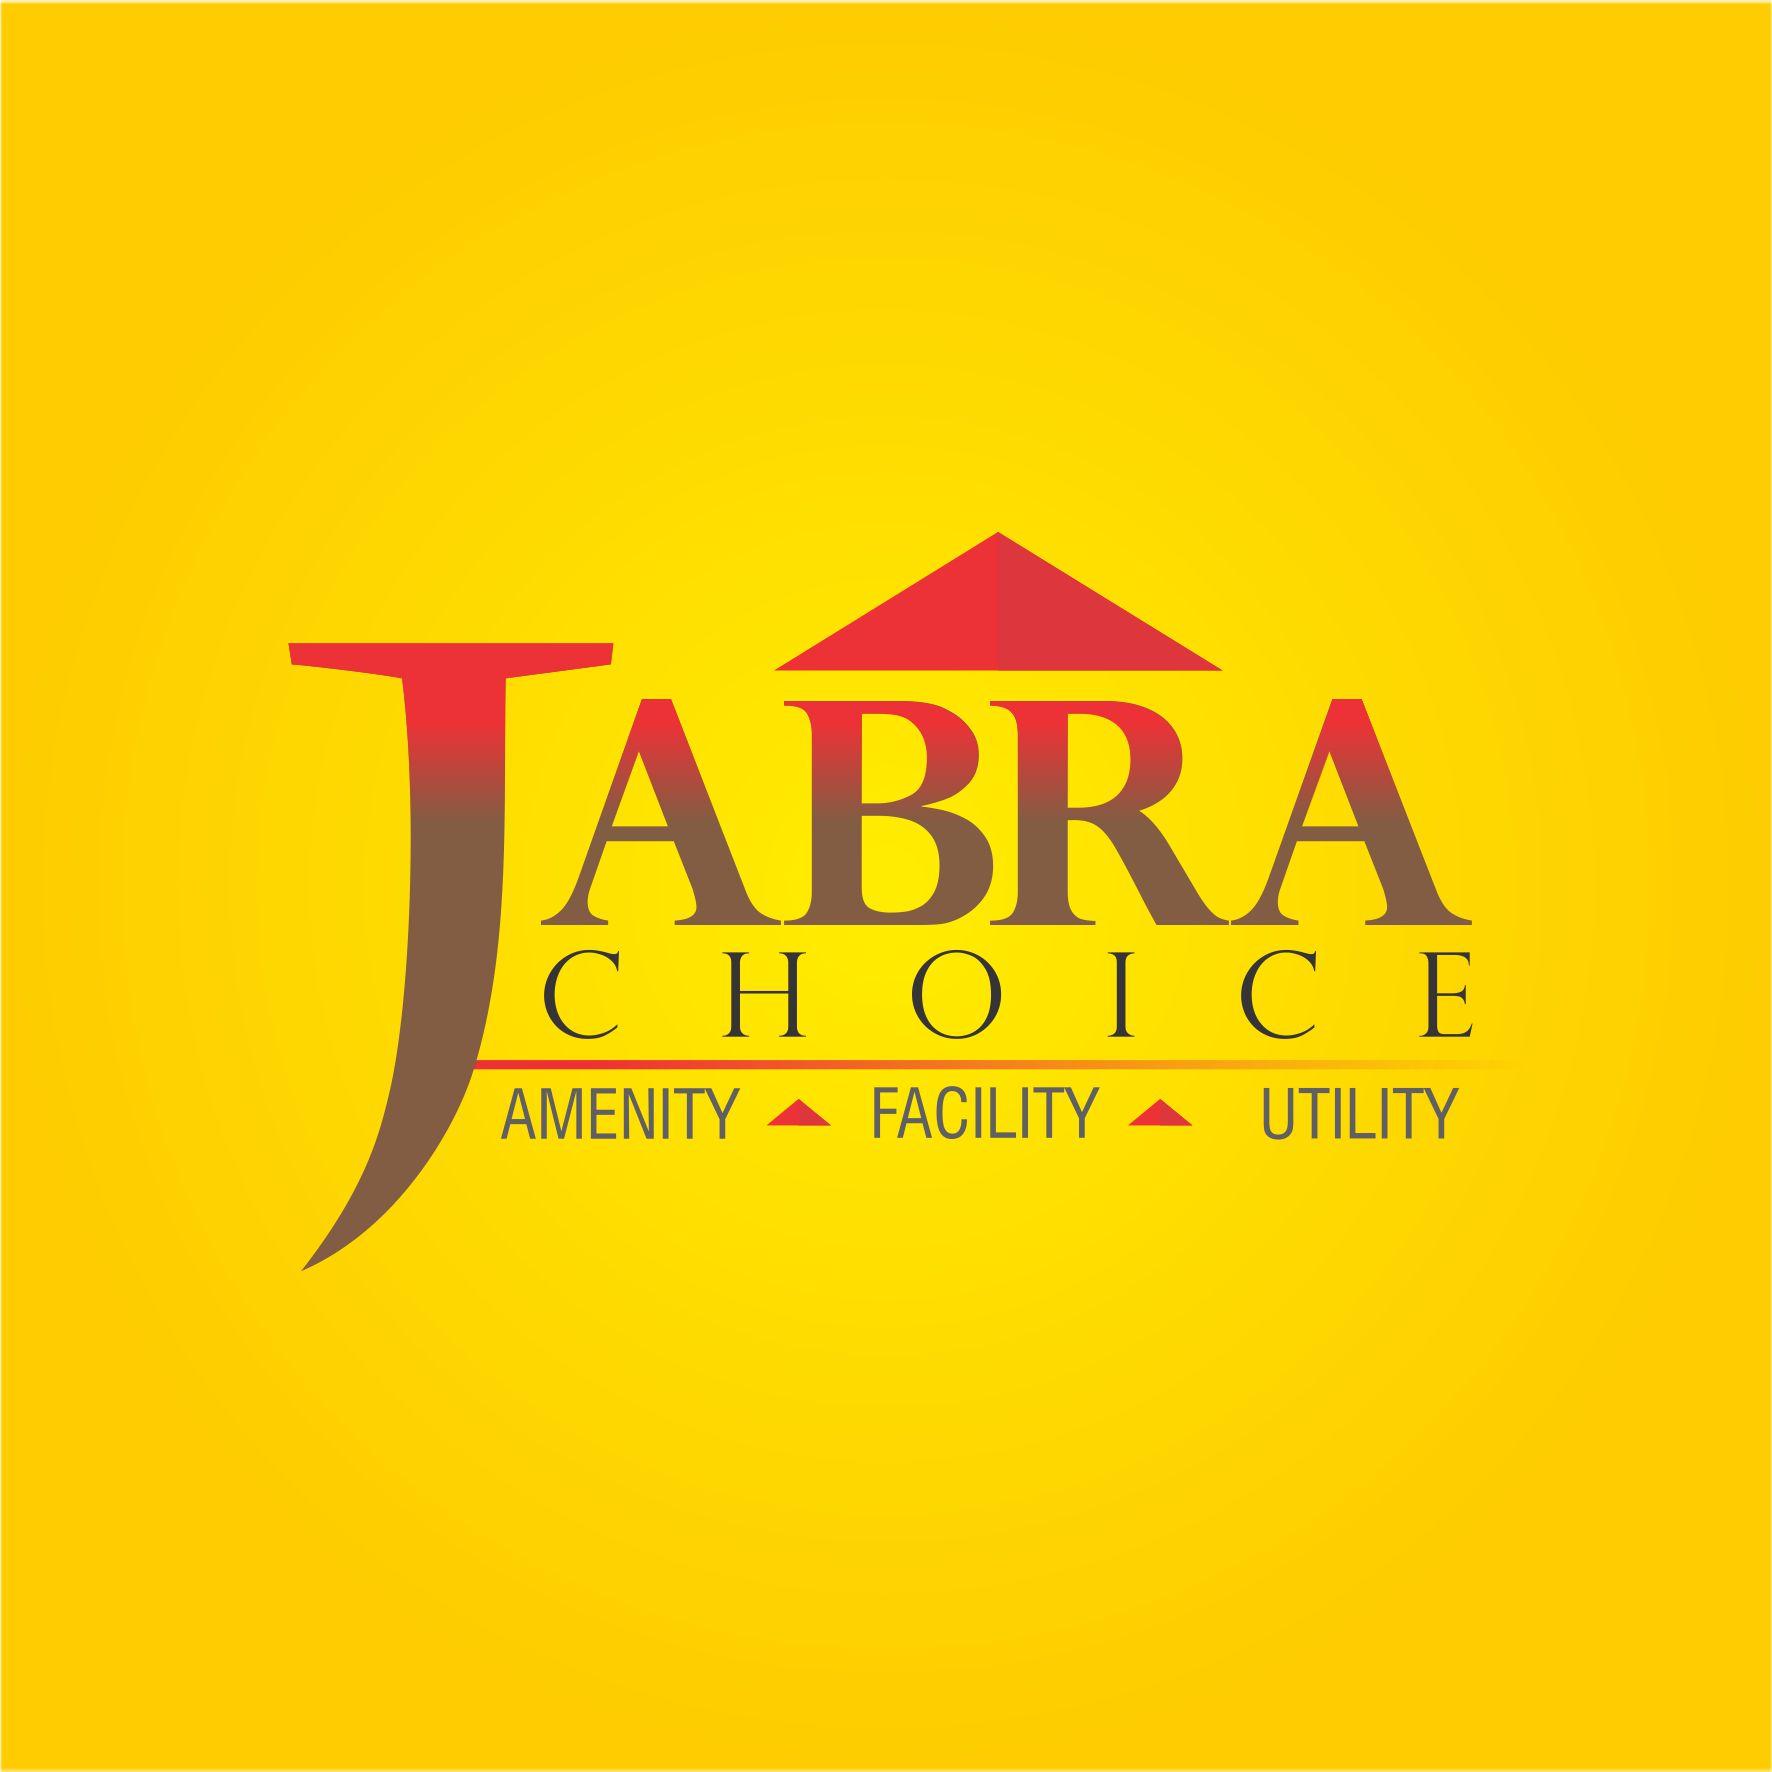 Jabra Choice Multi-solution pvt. ltd